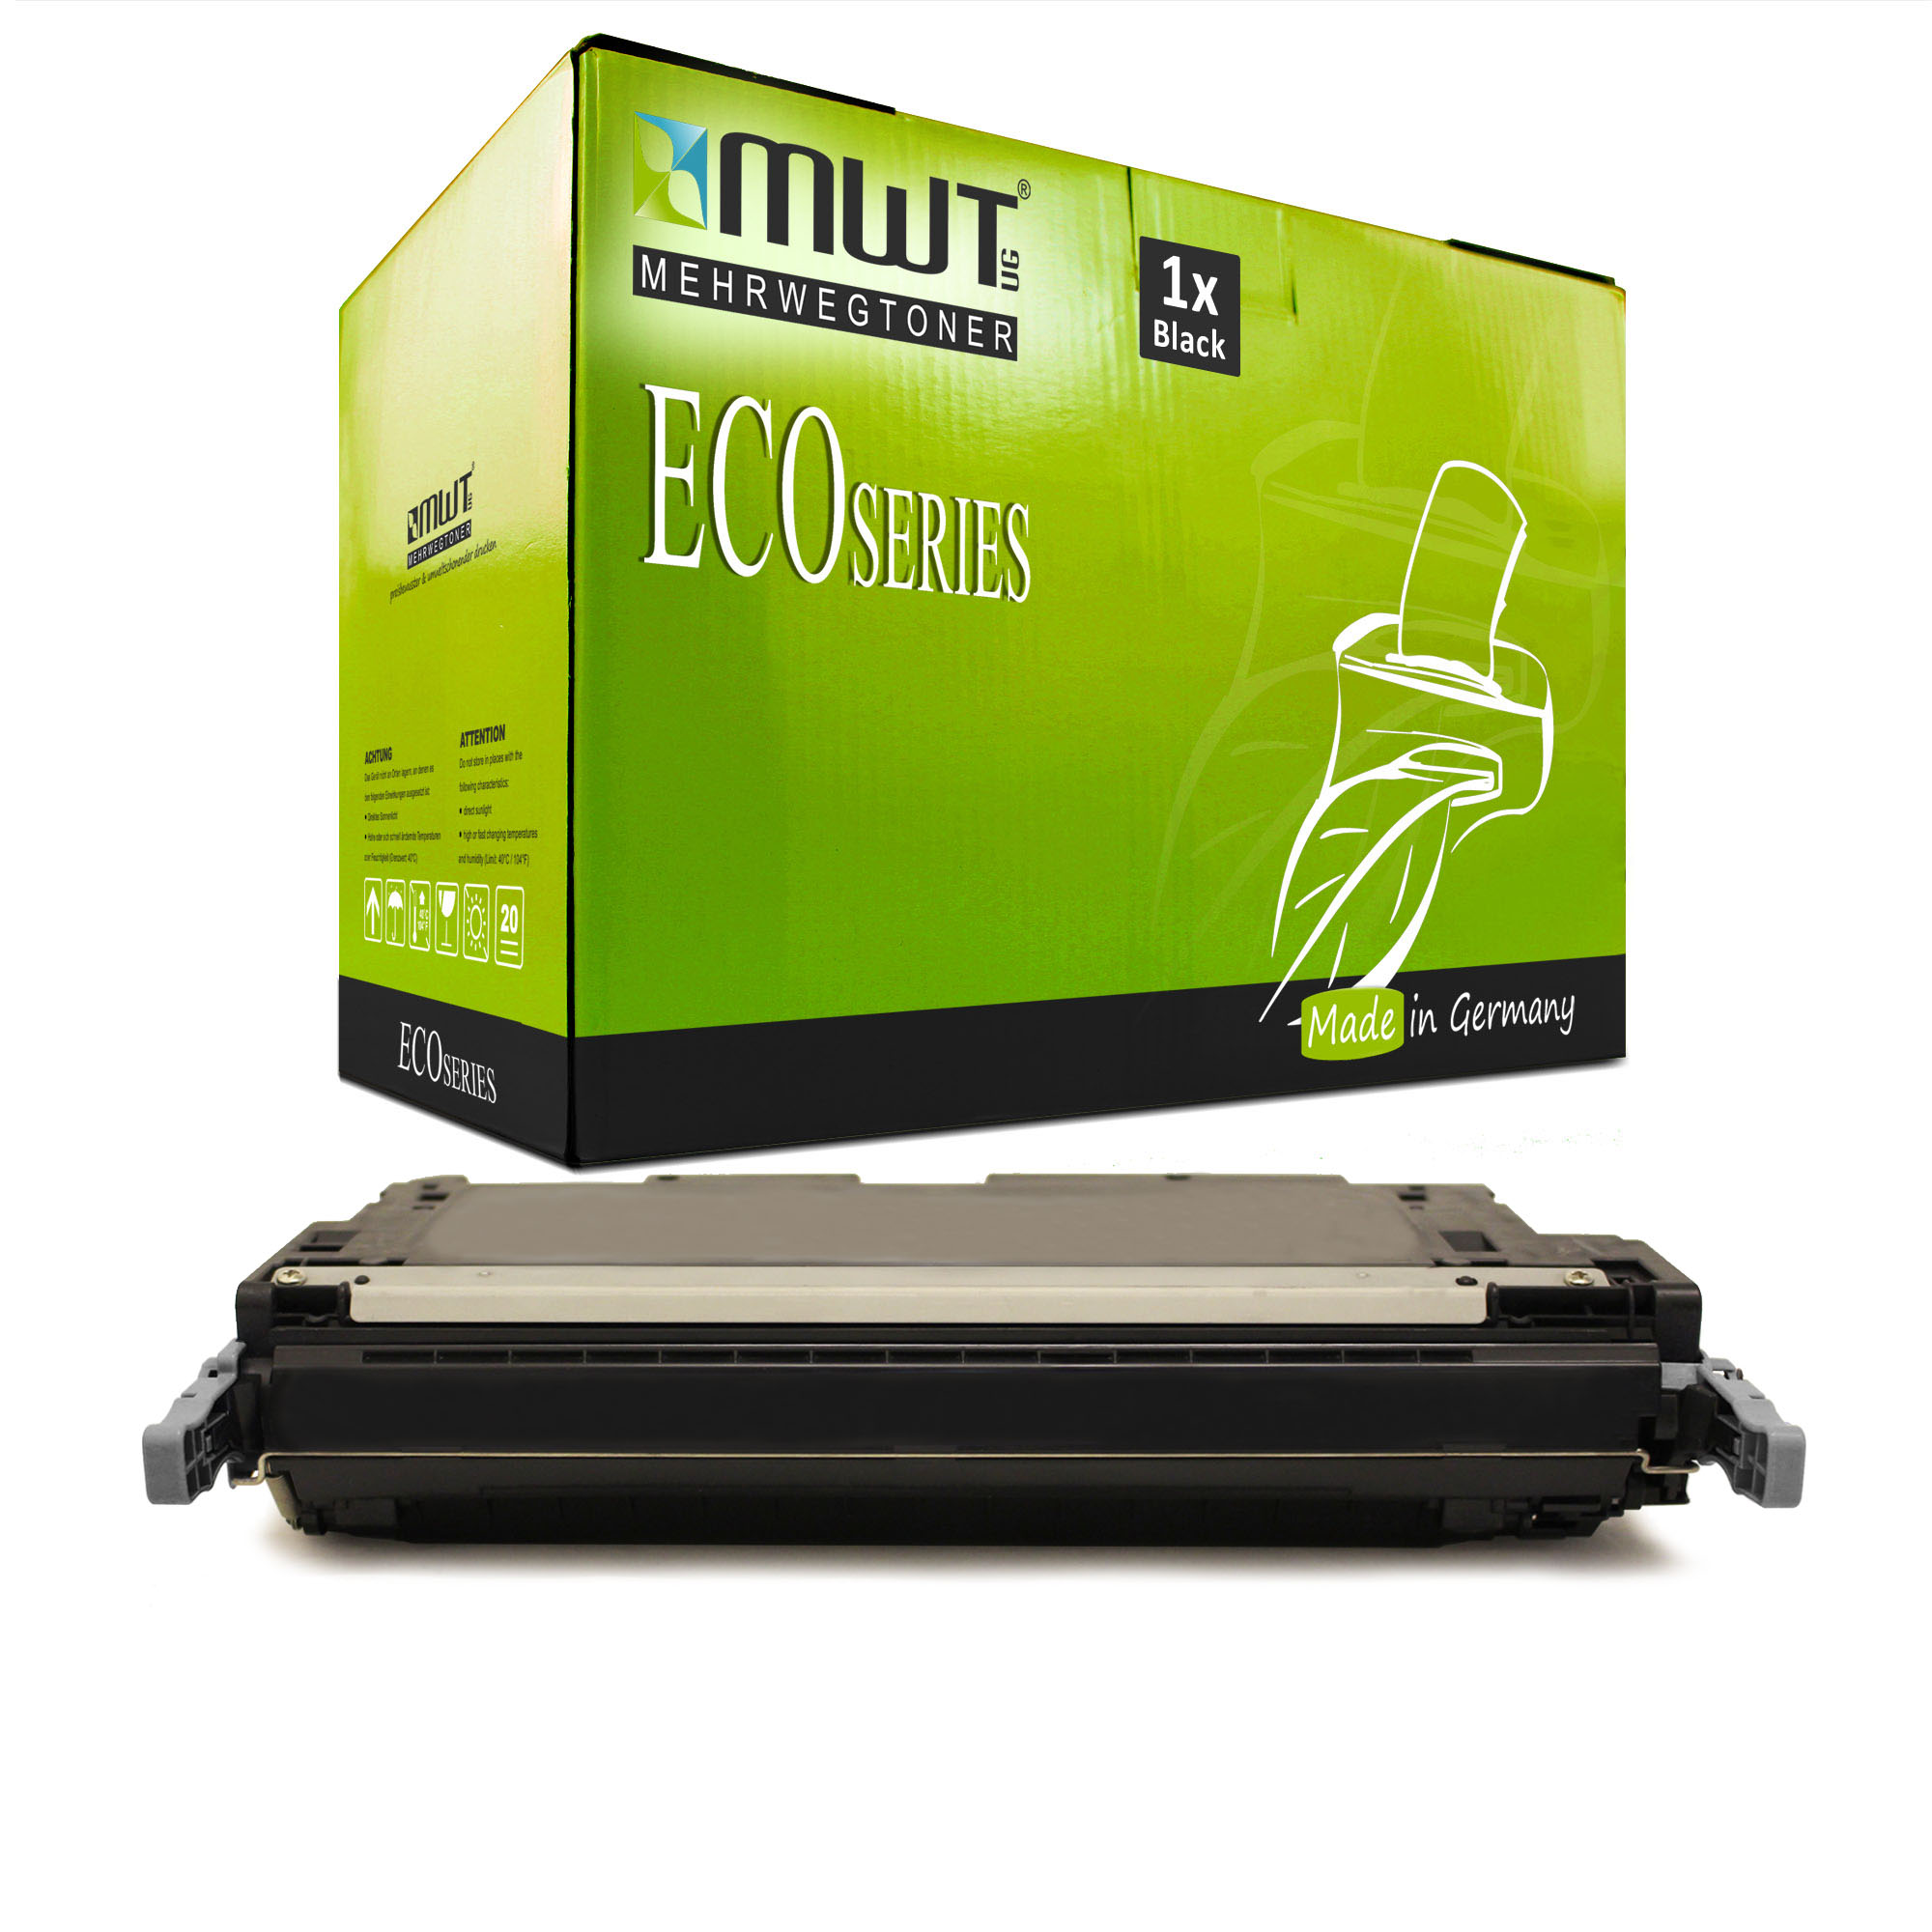 Mwt-Eco-toner-noir-remplace-HP-643-A-q5950a